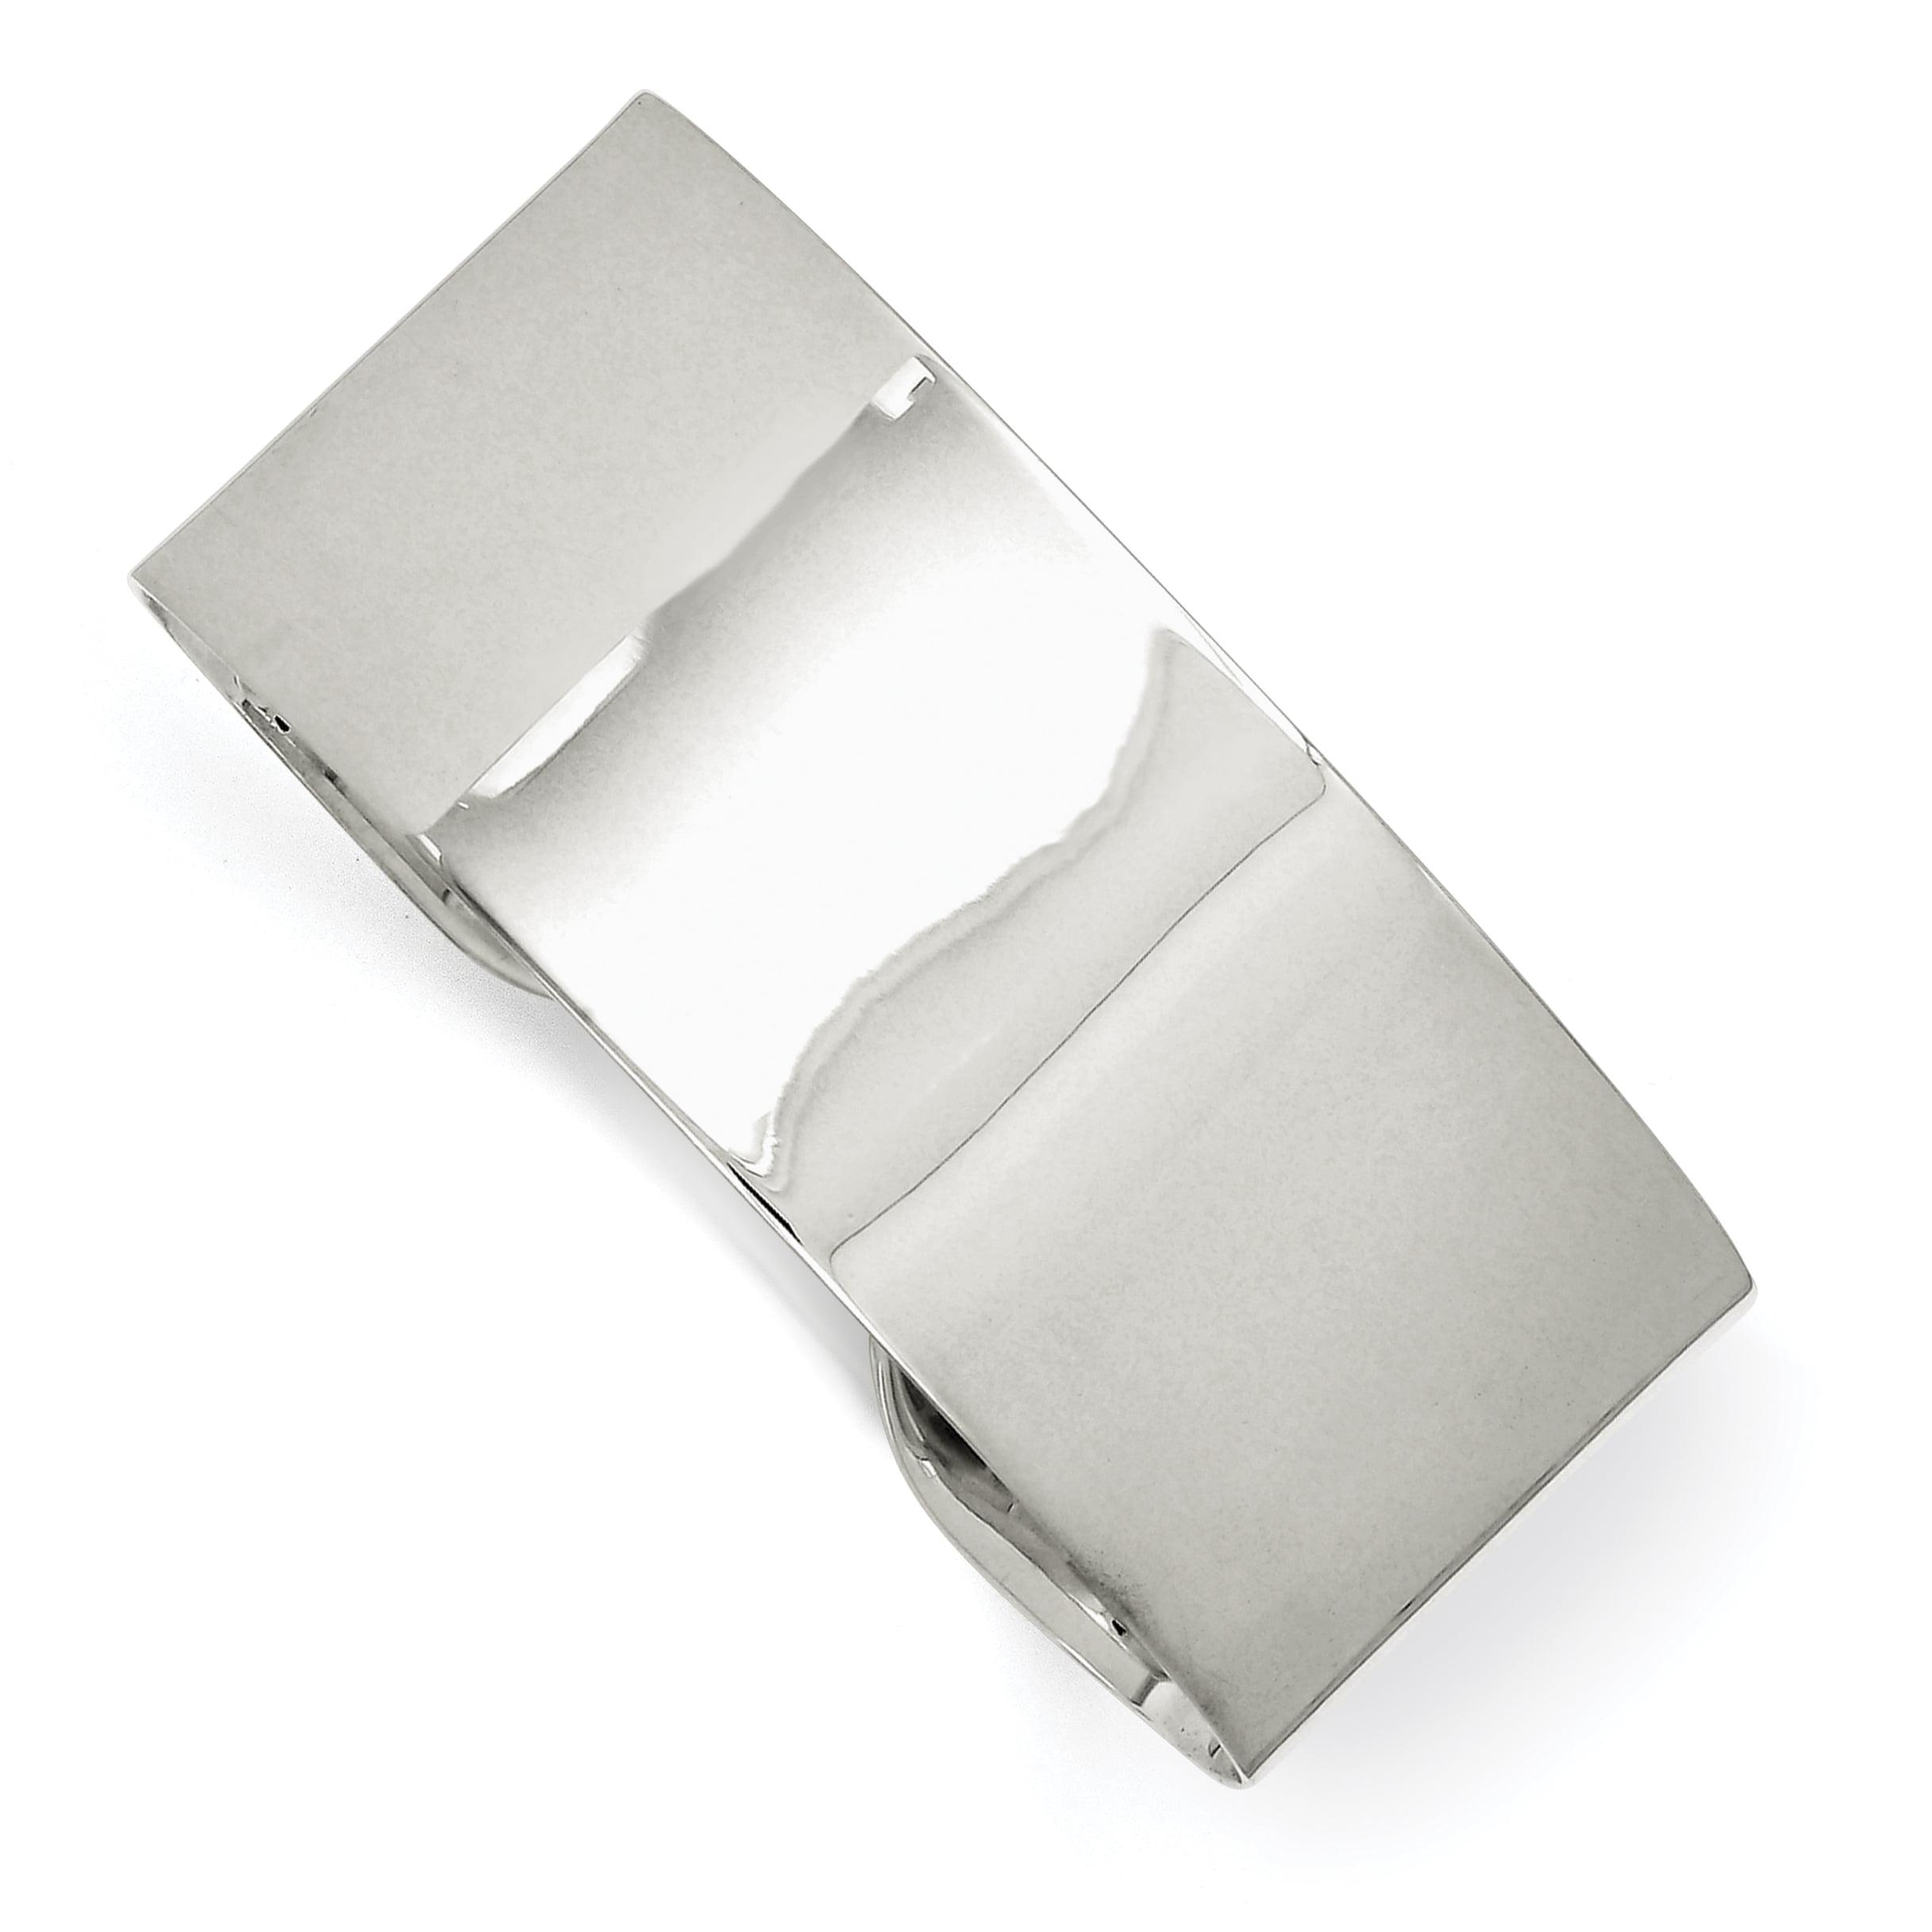 "Sterling Silver 25.25mm Fancy Cuff Bangle Bracelet Inch ""Bracelets - image 2 of 2"